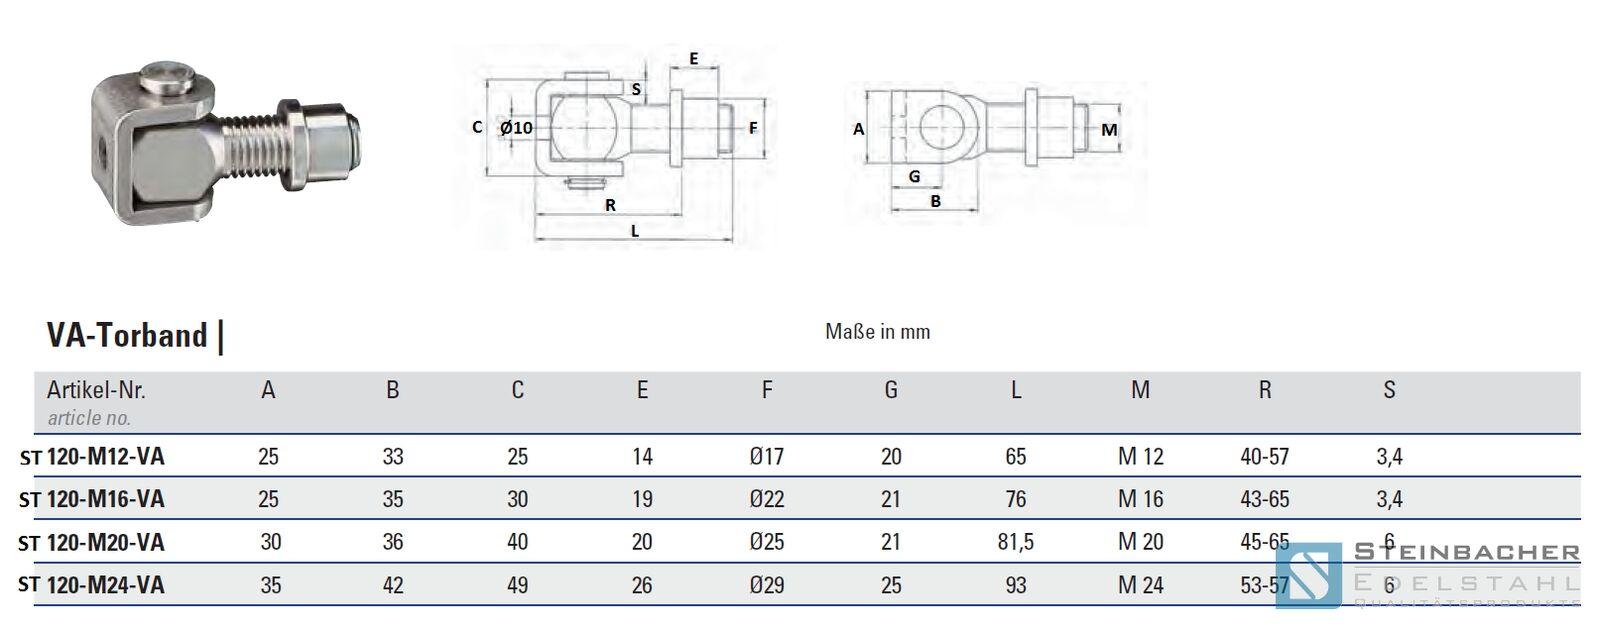 edelstahl torband torangel va scharnier tor tür m12 m16 m20 m24